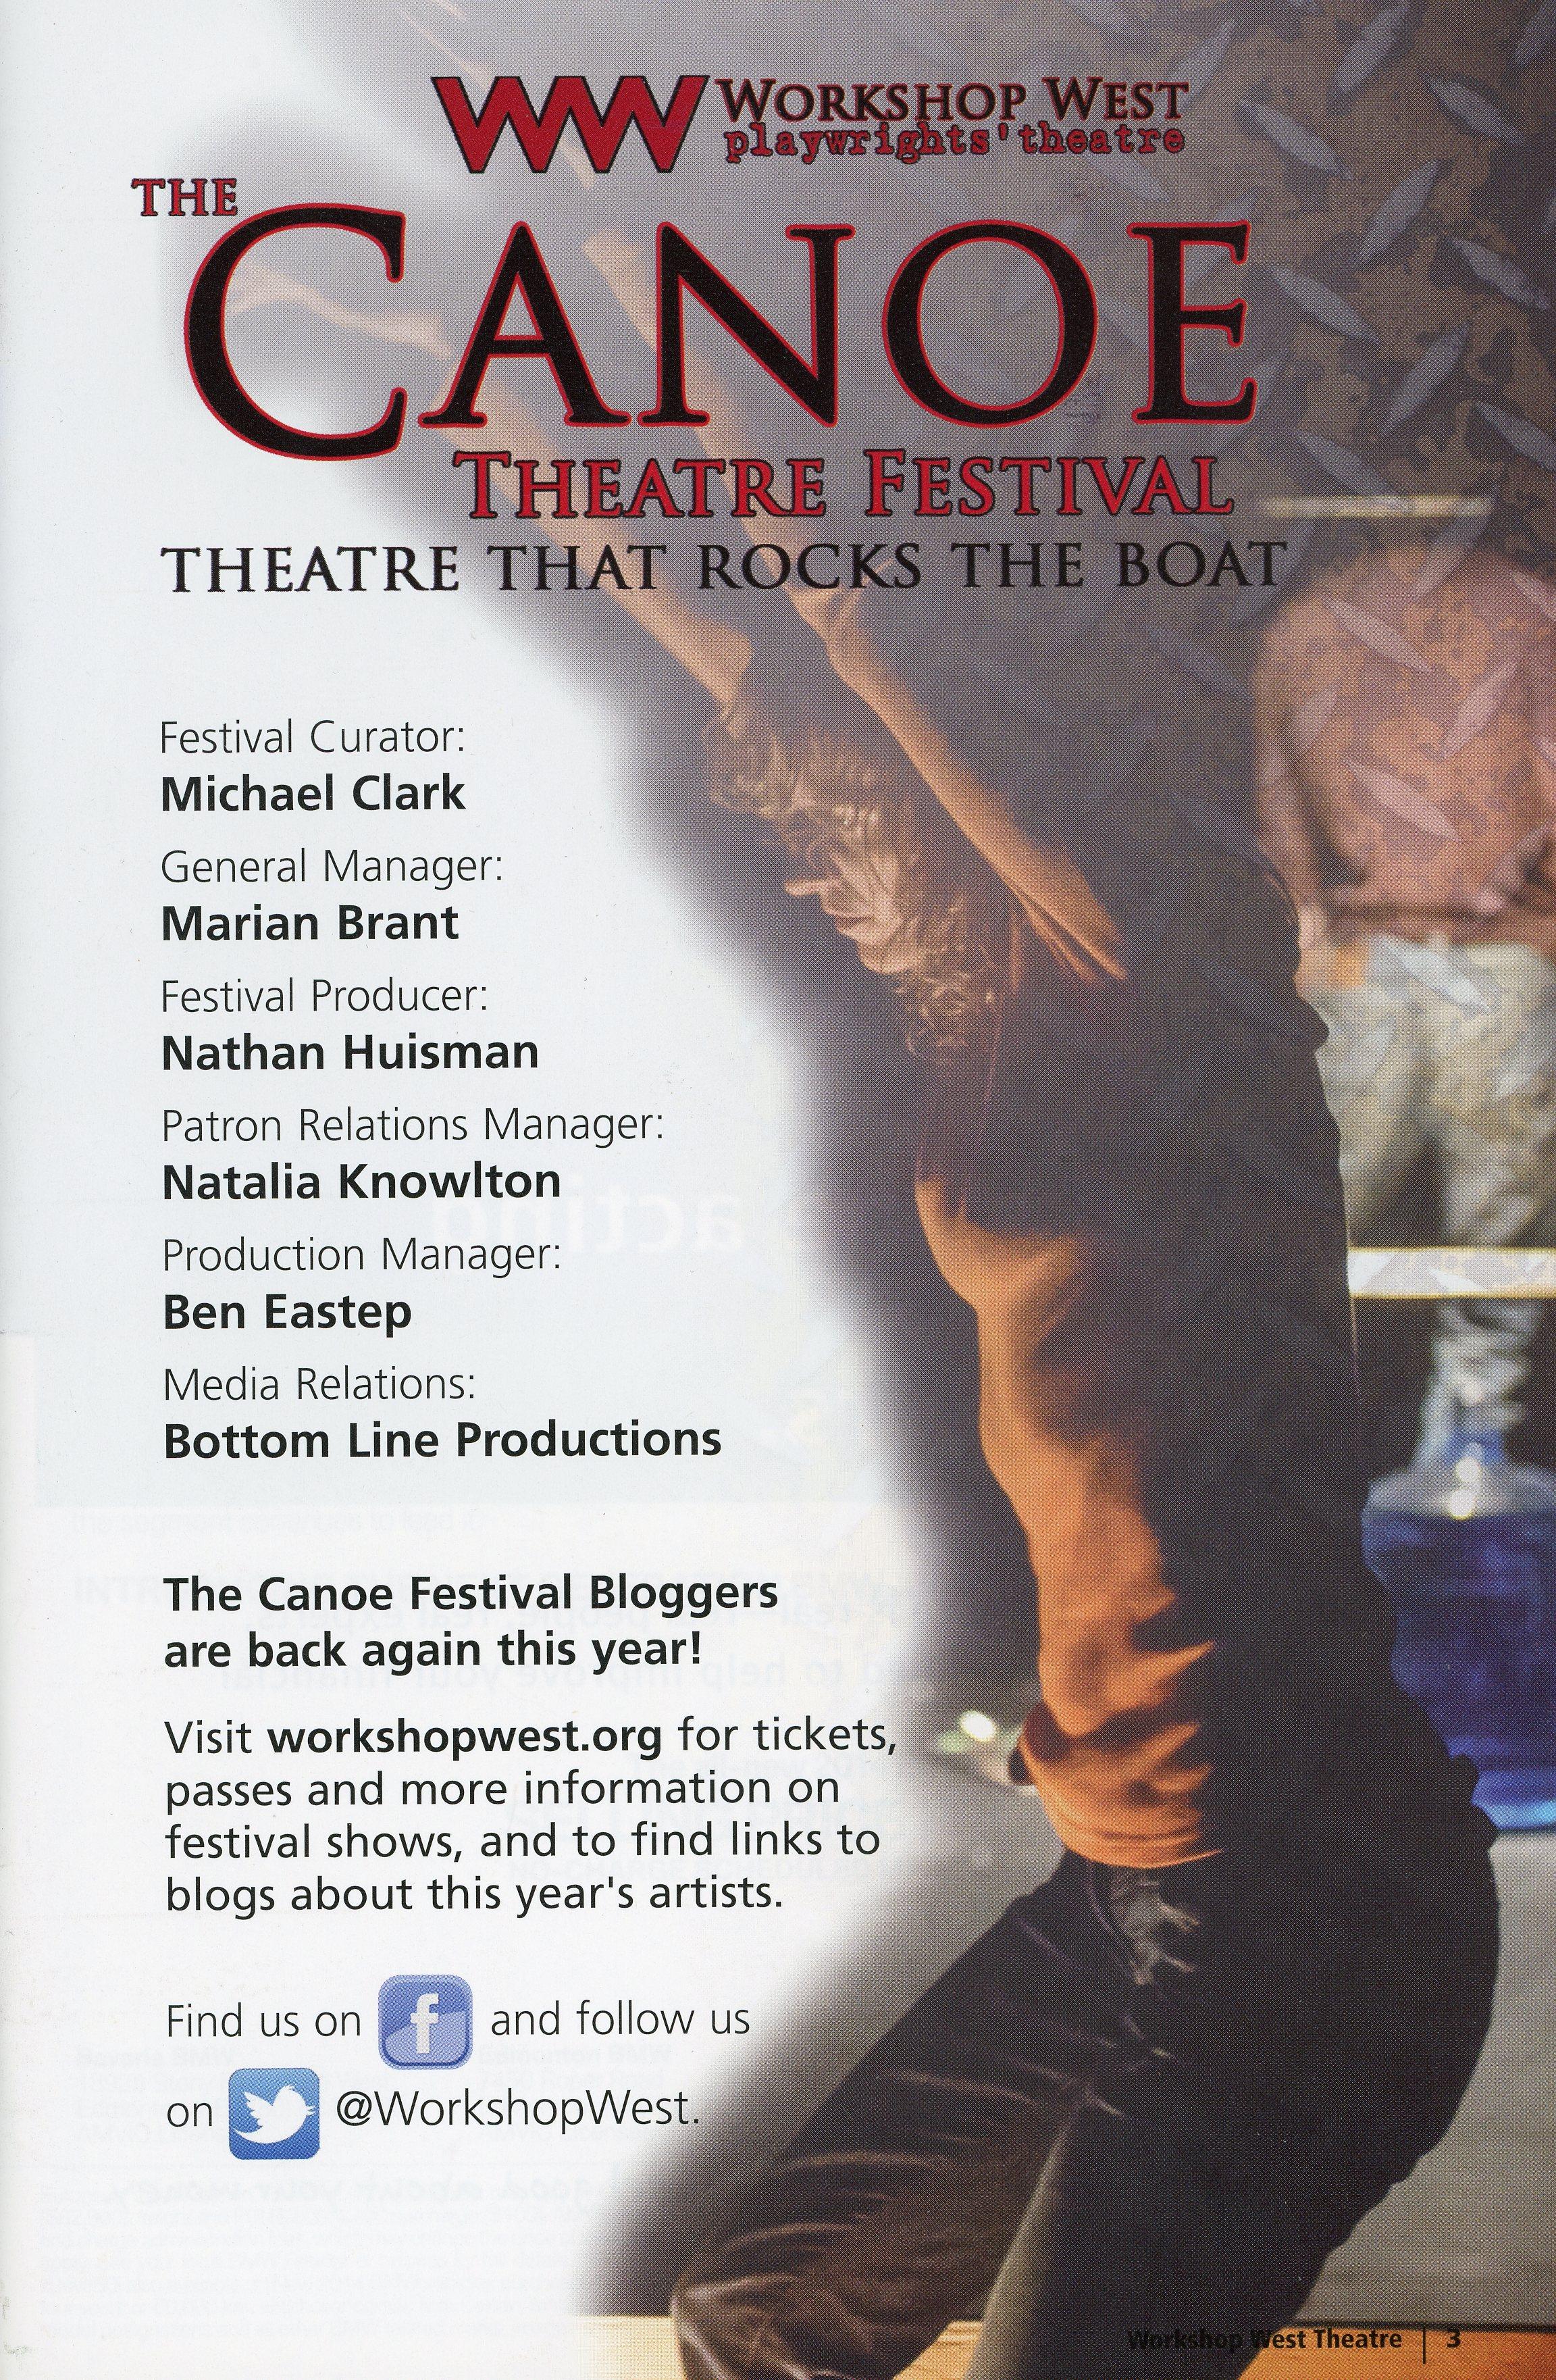 The Canoe Theatre Festival (January 2014)-Production Information_JPEG.jpg